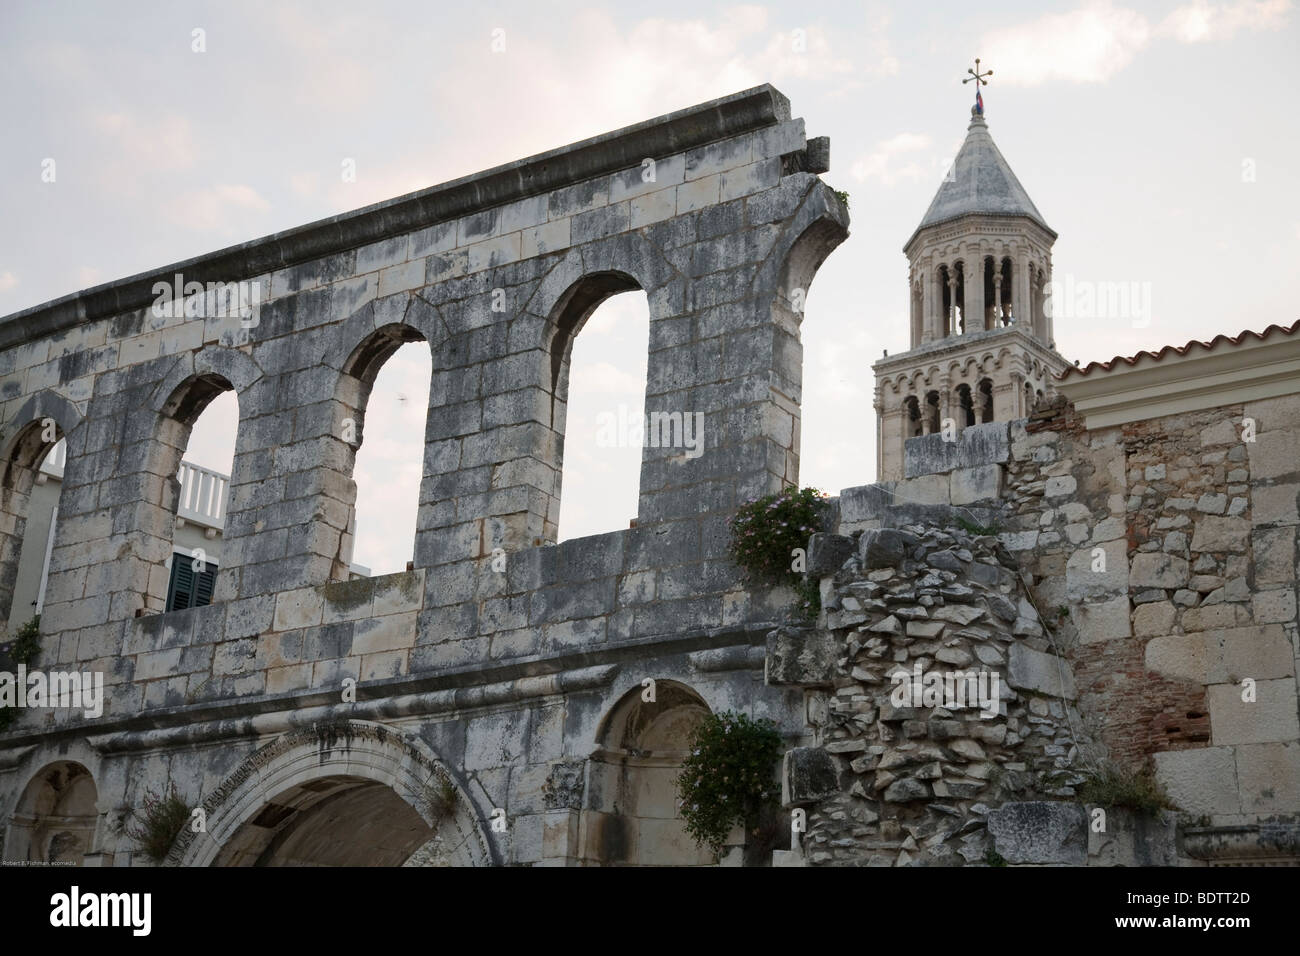 teil der alten mauer des diokletianspalast, part of the old wall of the diocletians palace, split, kroatien, croatia, - Stock Image